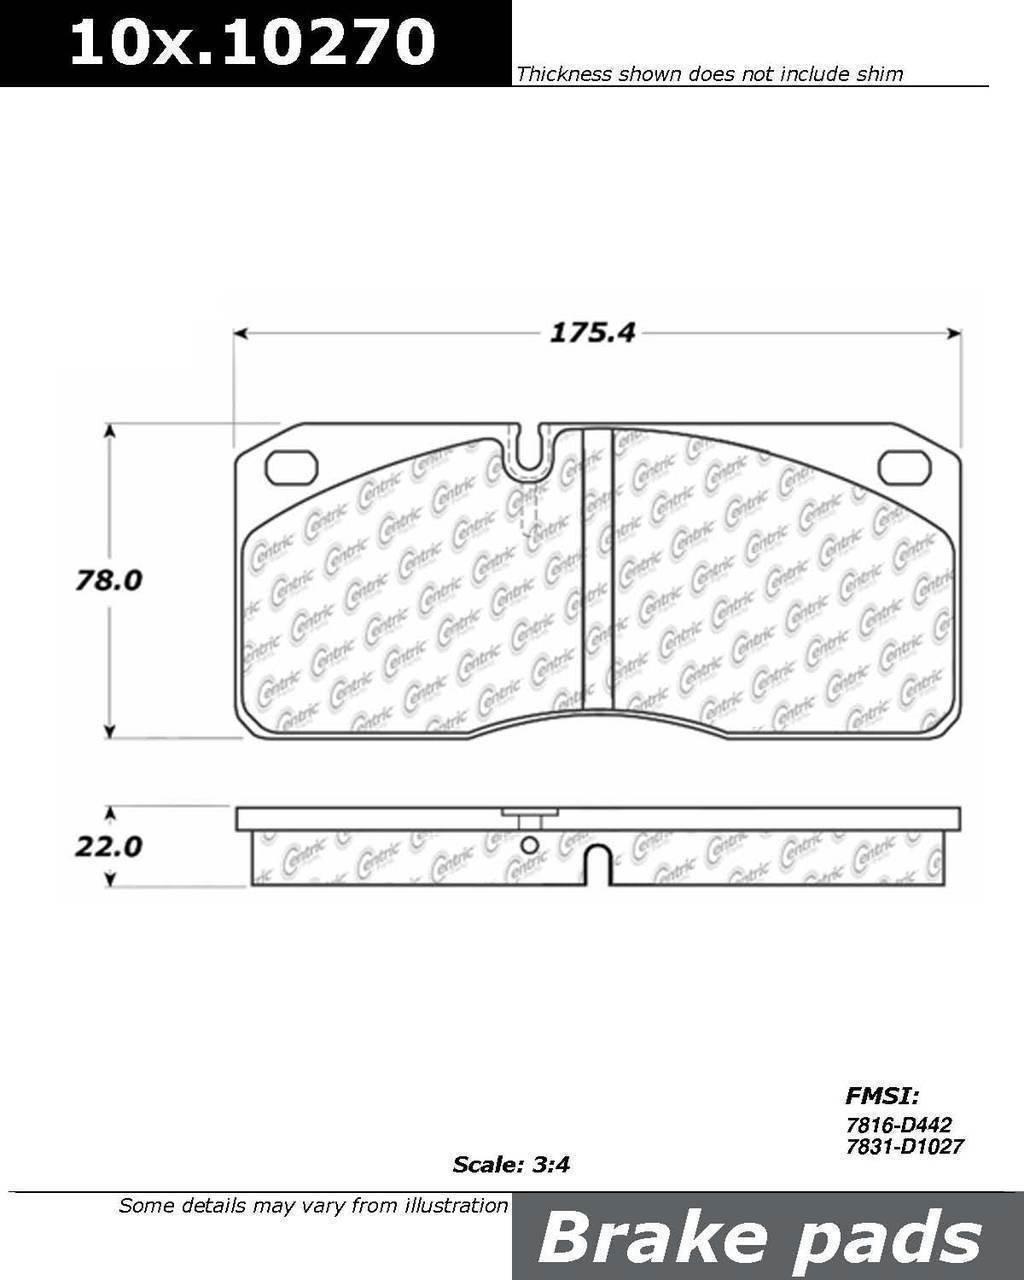 centric 100.10270 Oem Brake Pads by Centric (Image #1)